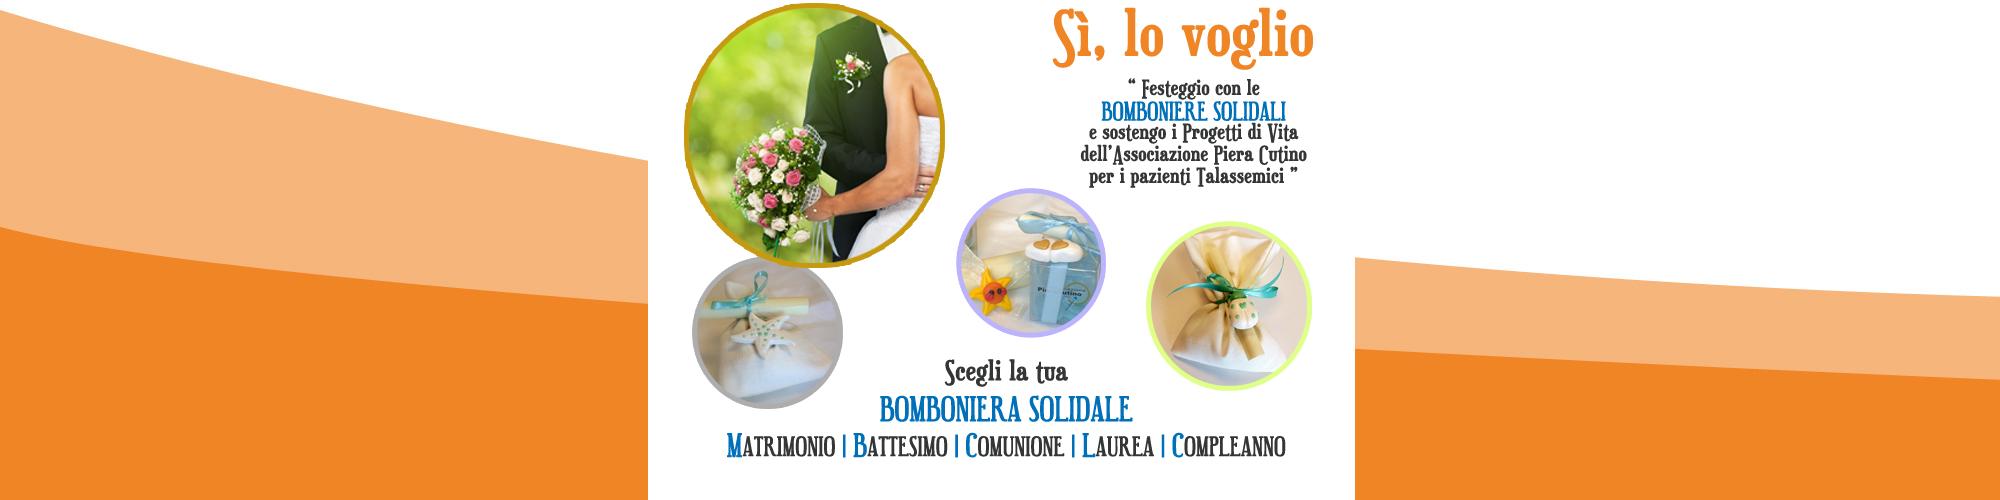 slider_bomboniere_sito